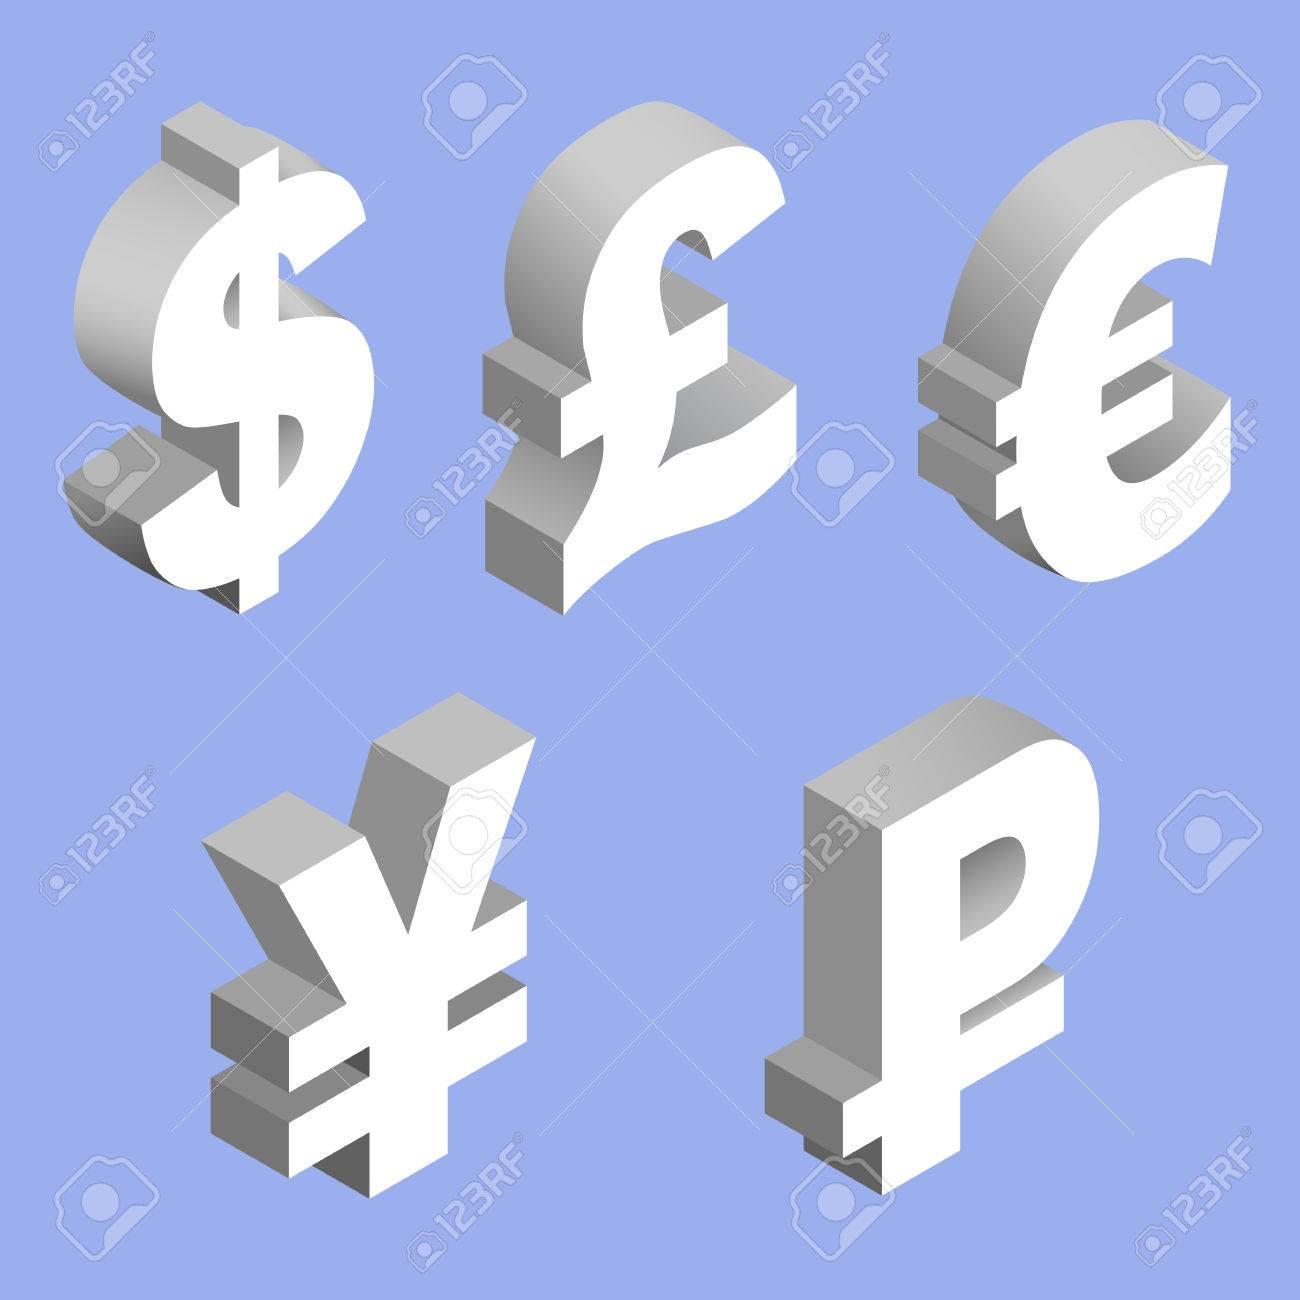 Isometric Set Of Currency Symbols Of The World Dollar Pound